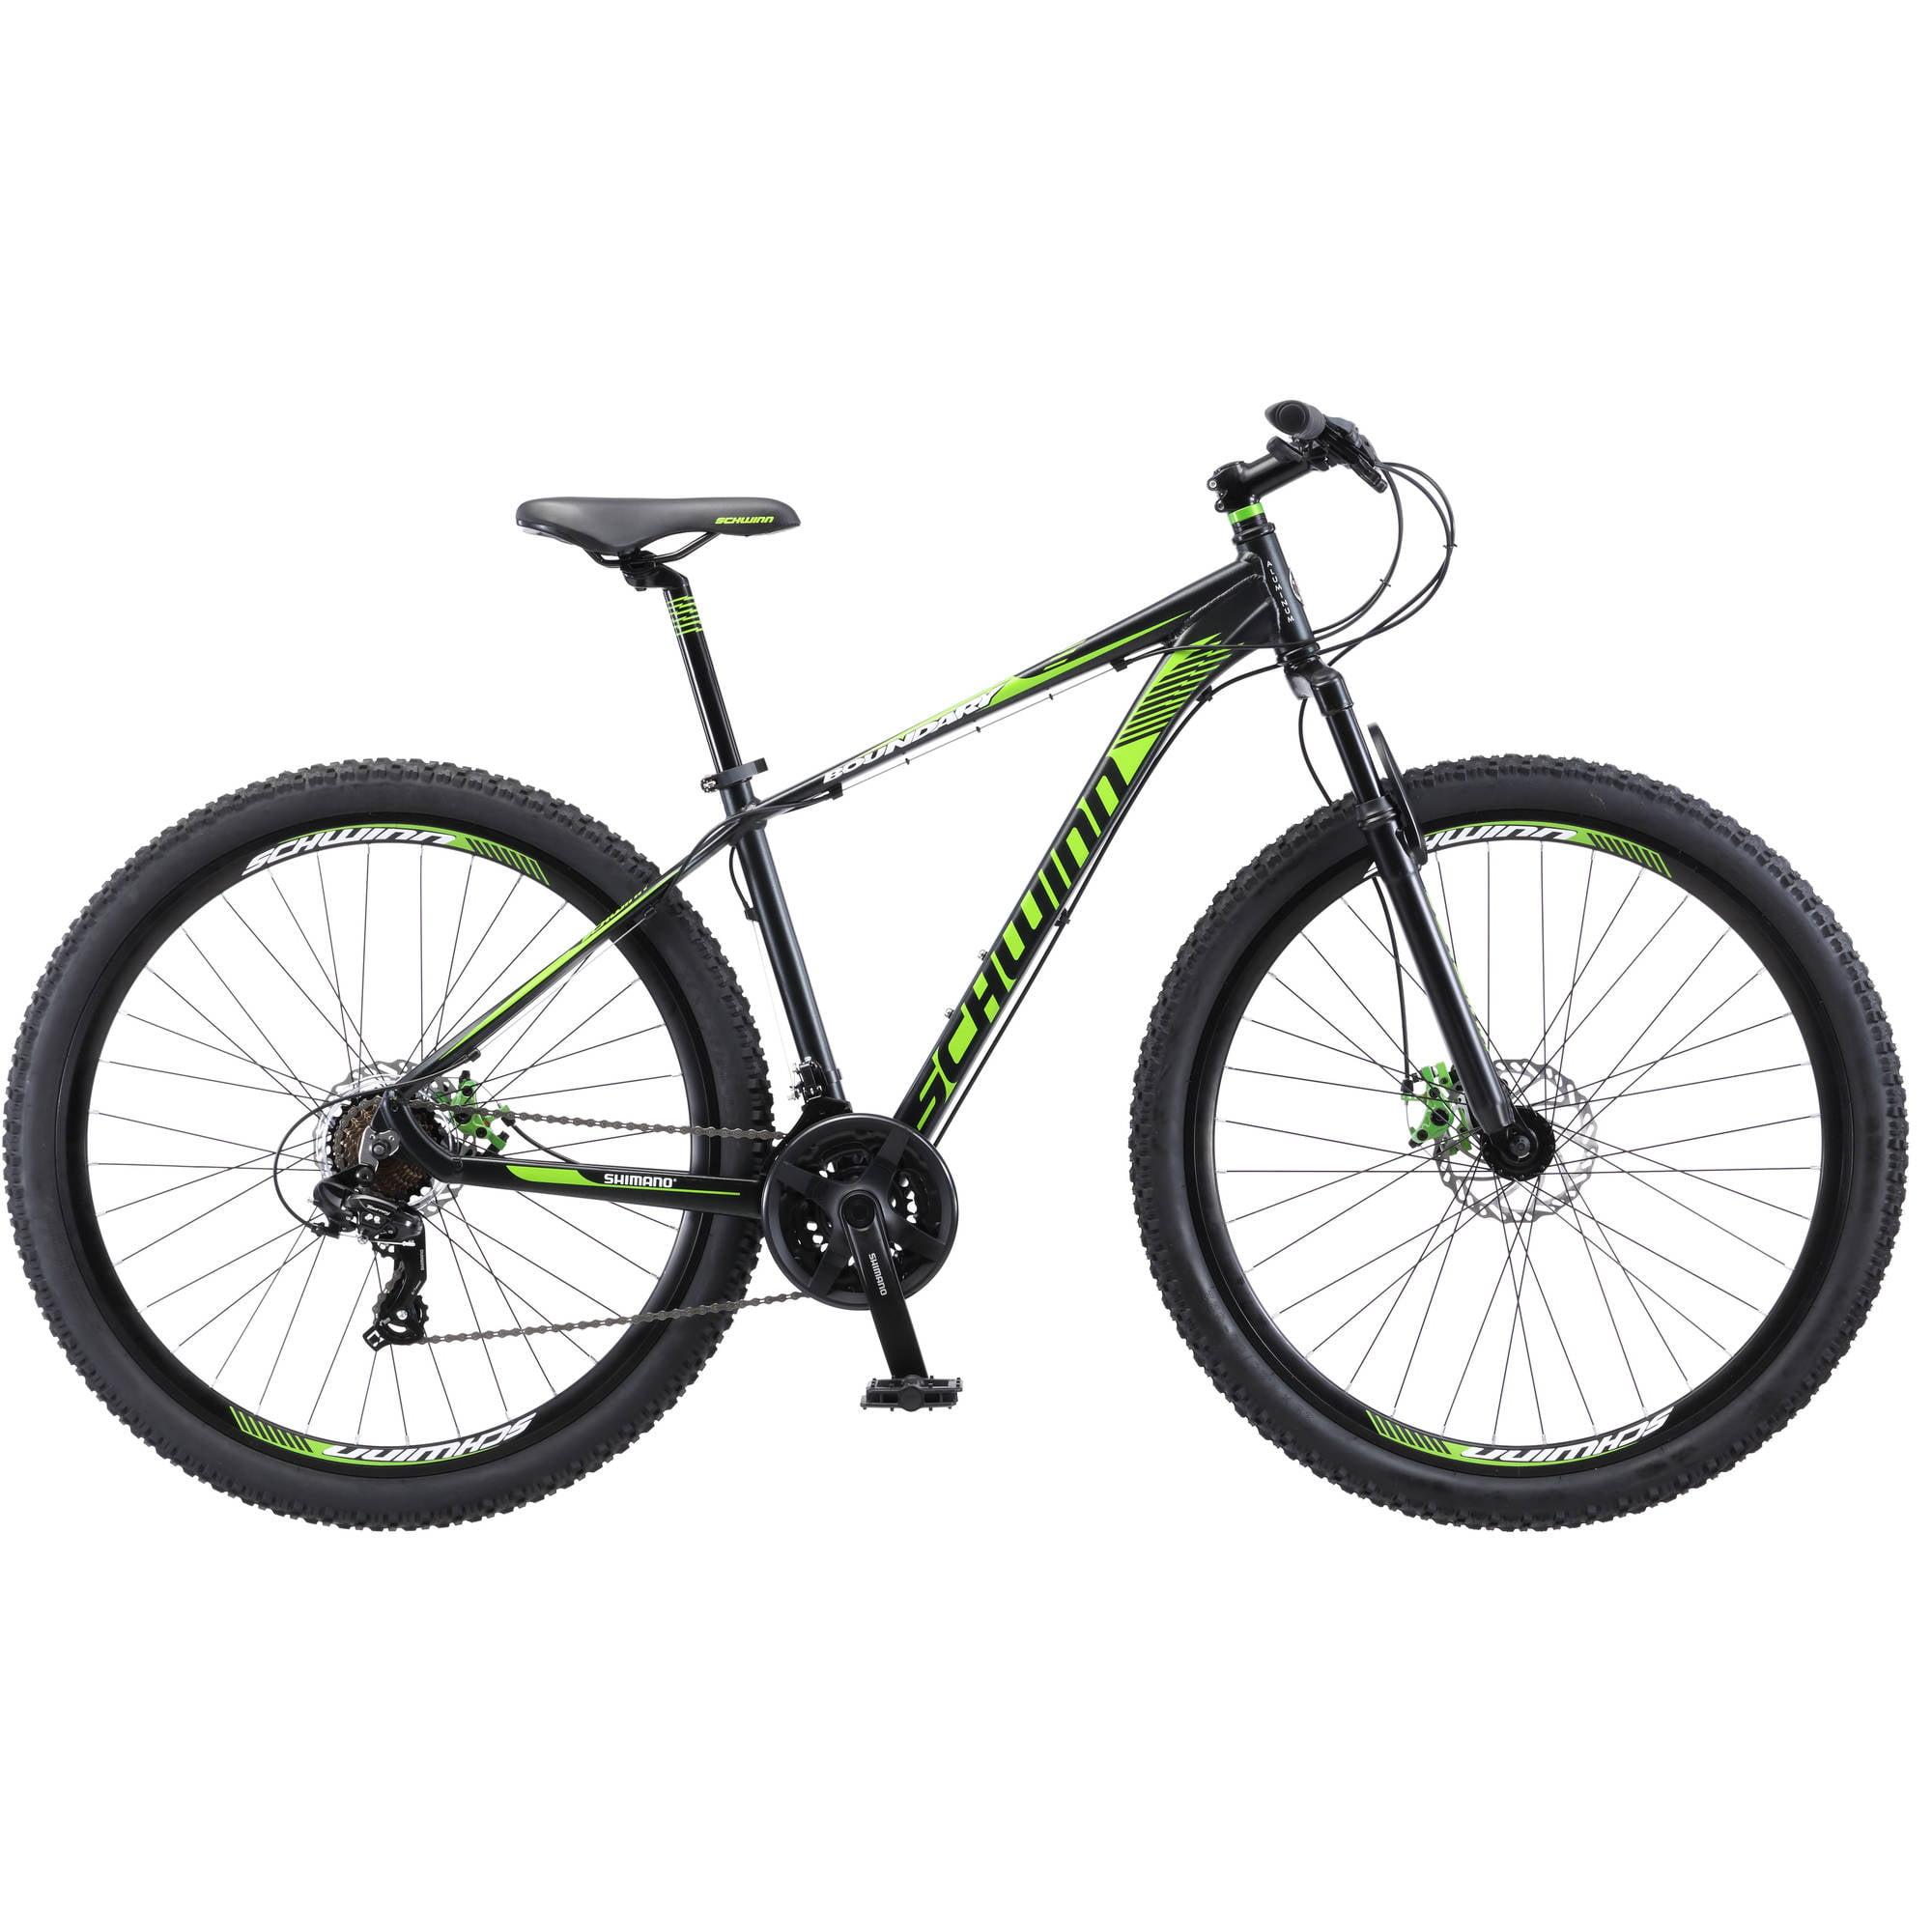 "29"" Men's Schwinn Boundary Mountain Bike, Dark Green and ..."